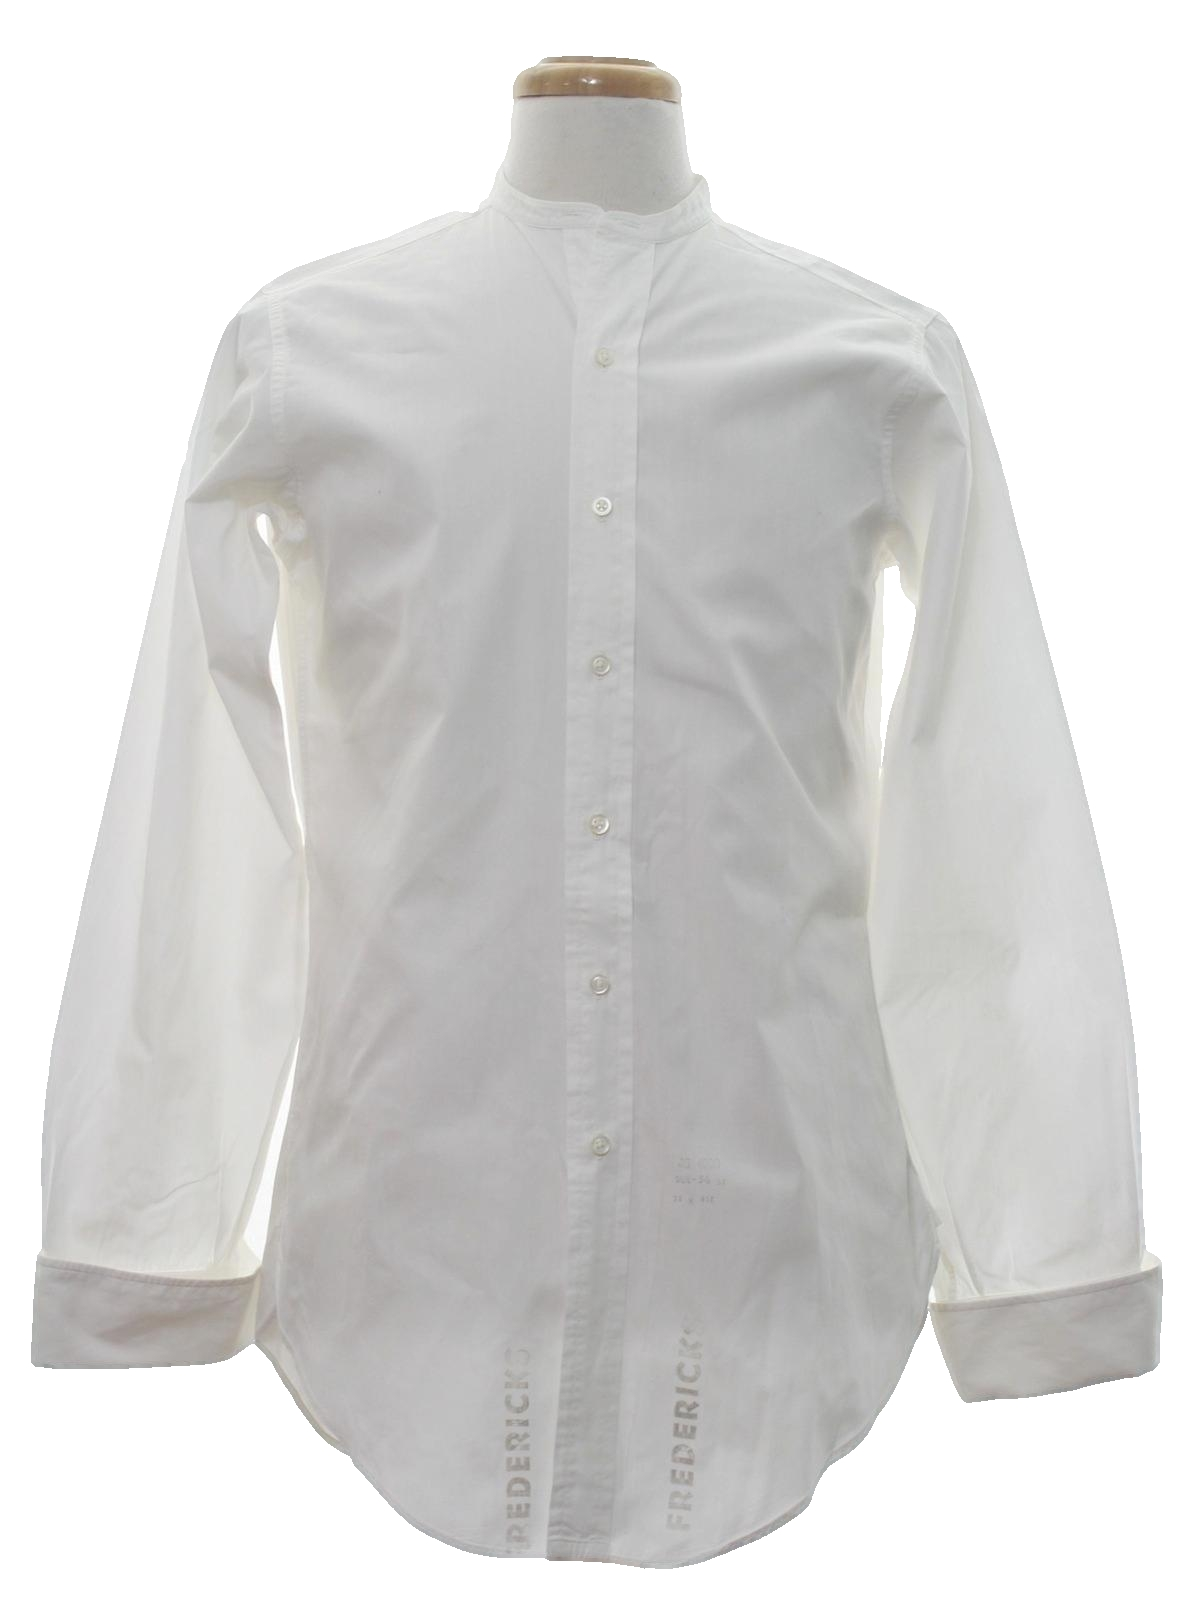 40s Viking National Shirt Shops Shirt 40s Viking National Shirt